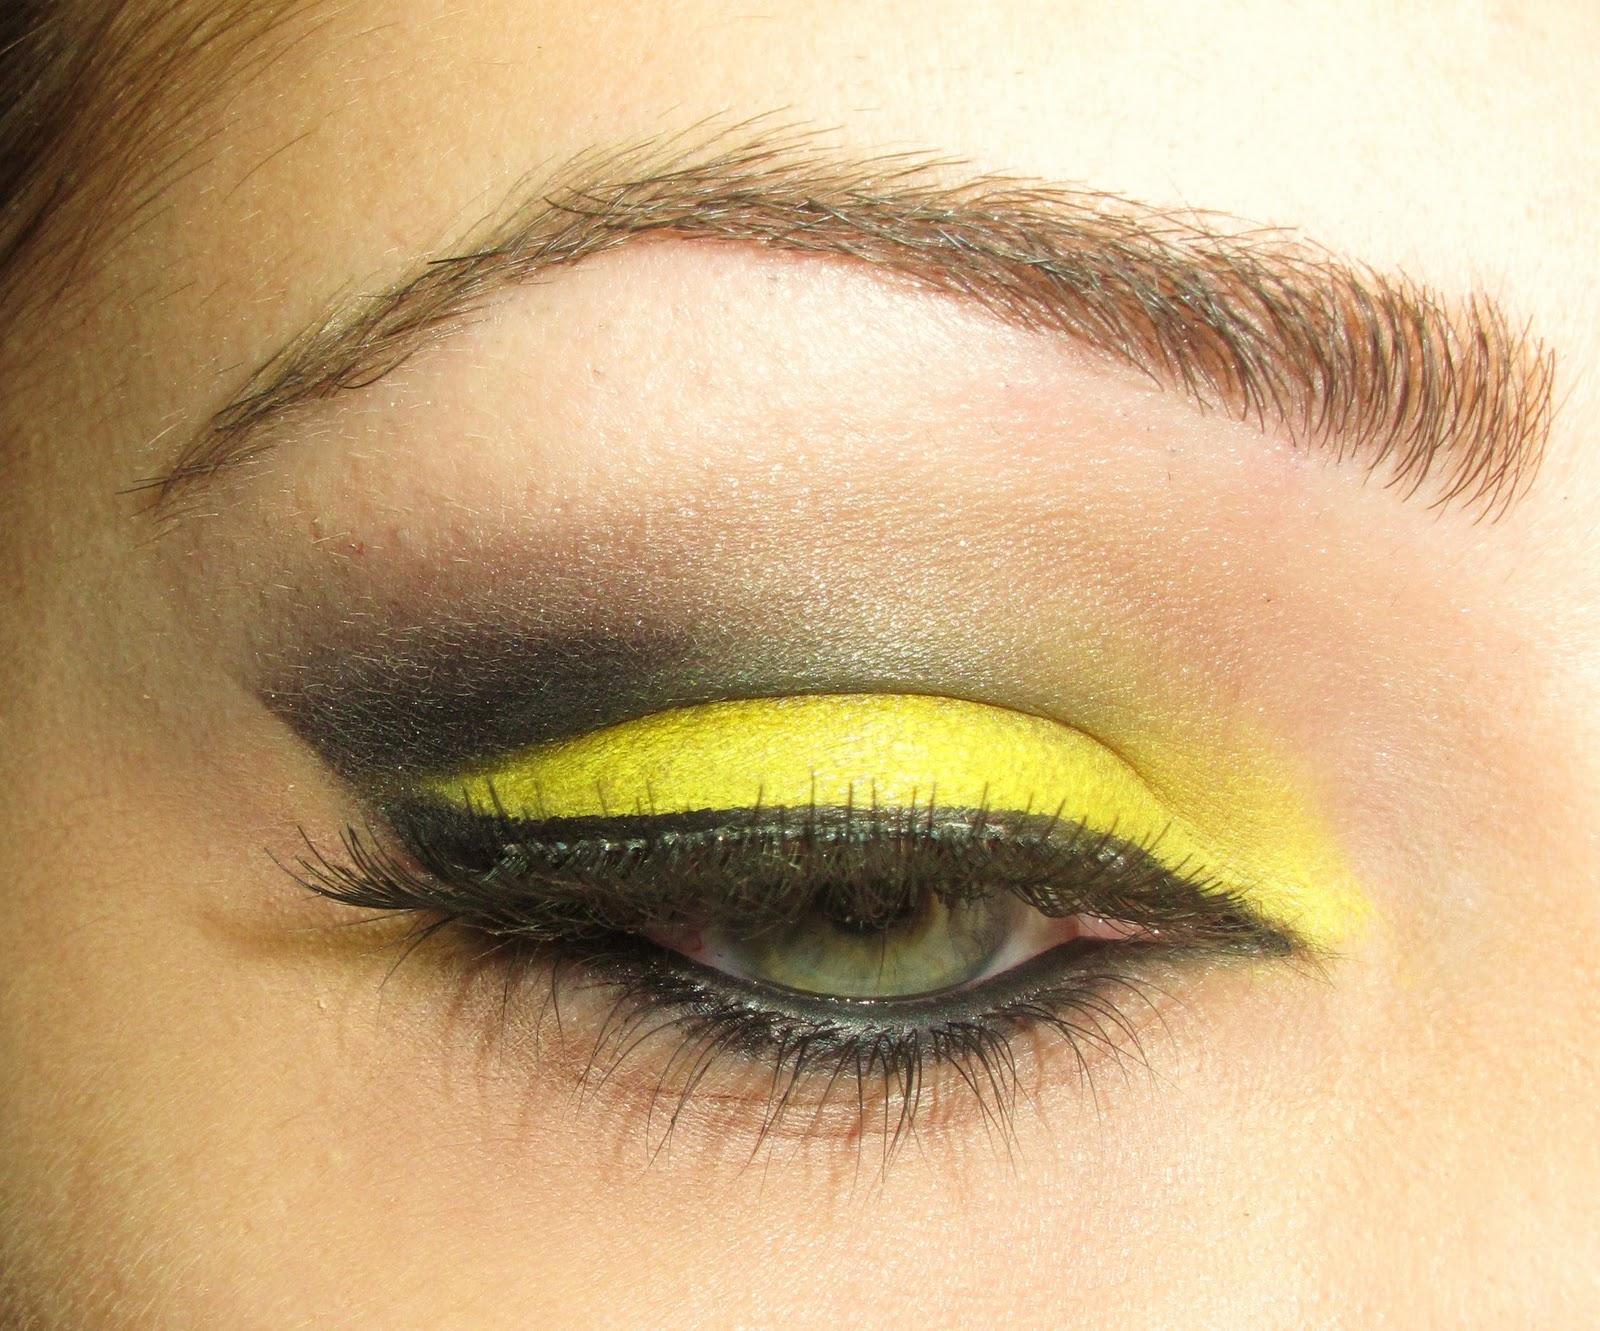 The Makeup Artist Yellowblack Eye Makeup